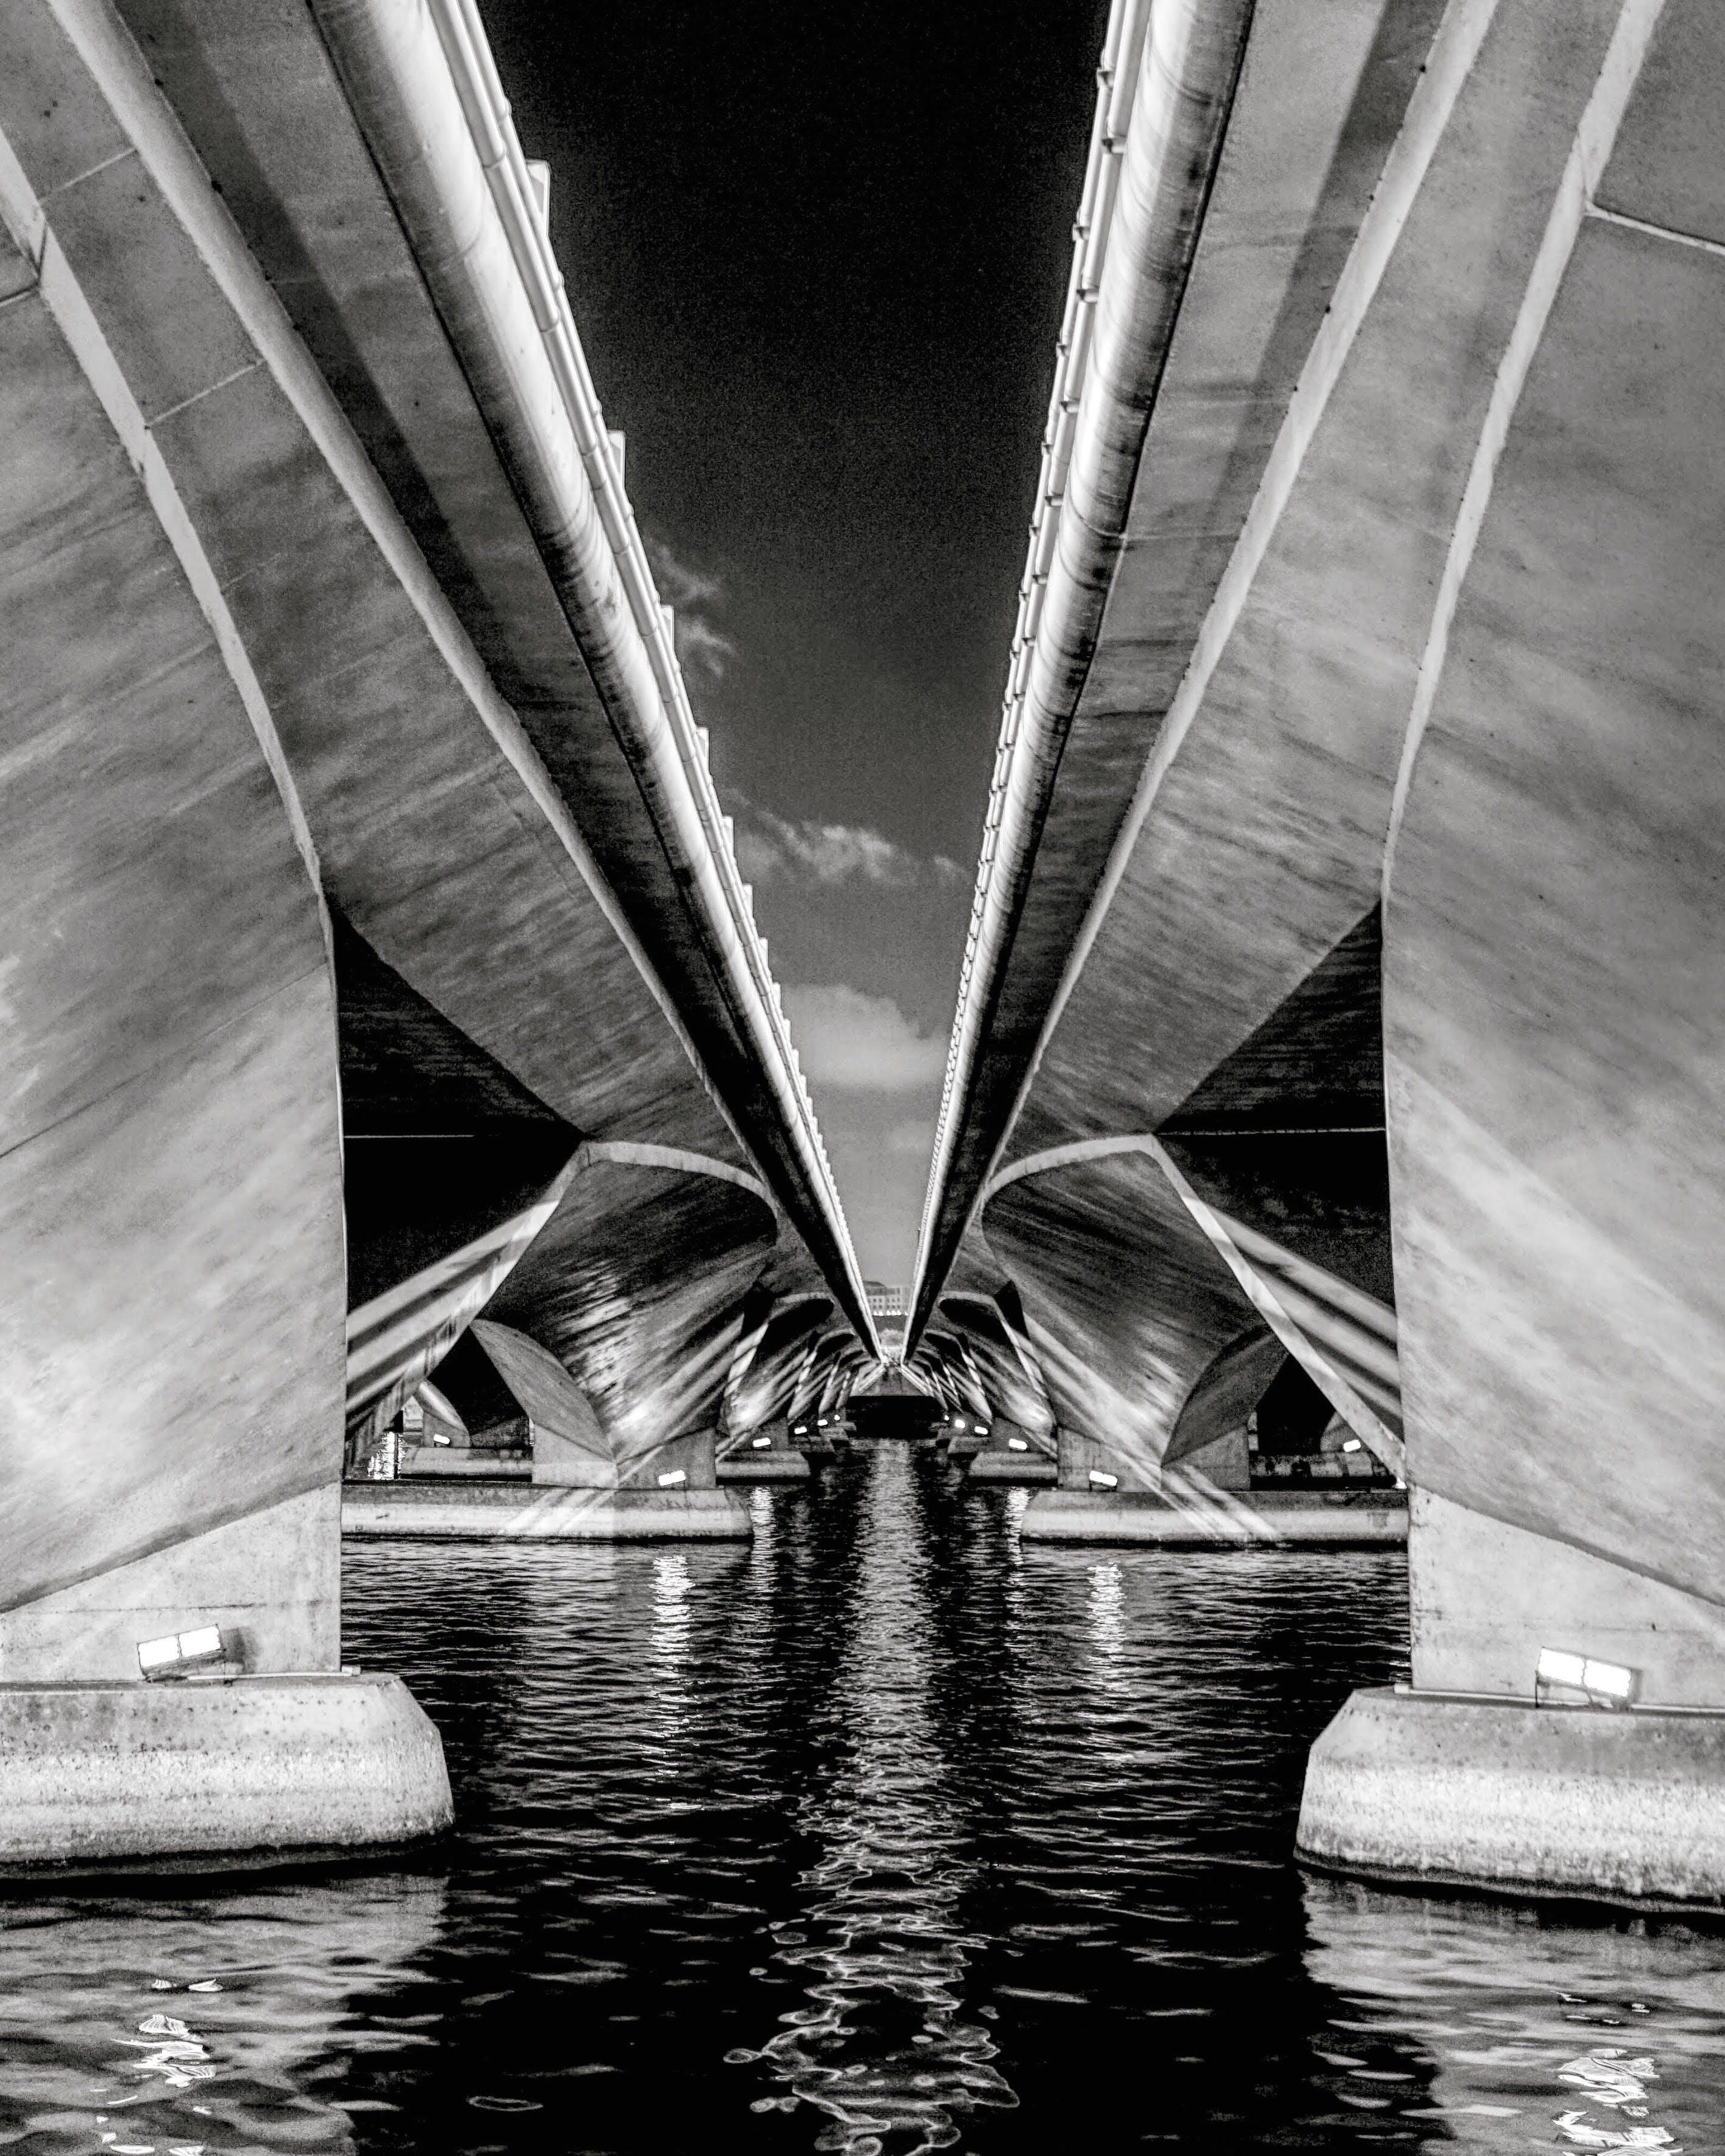 architektur, beton, brücke